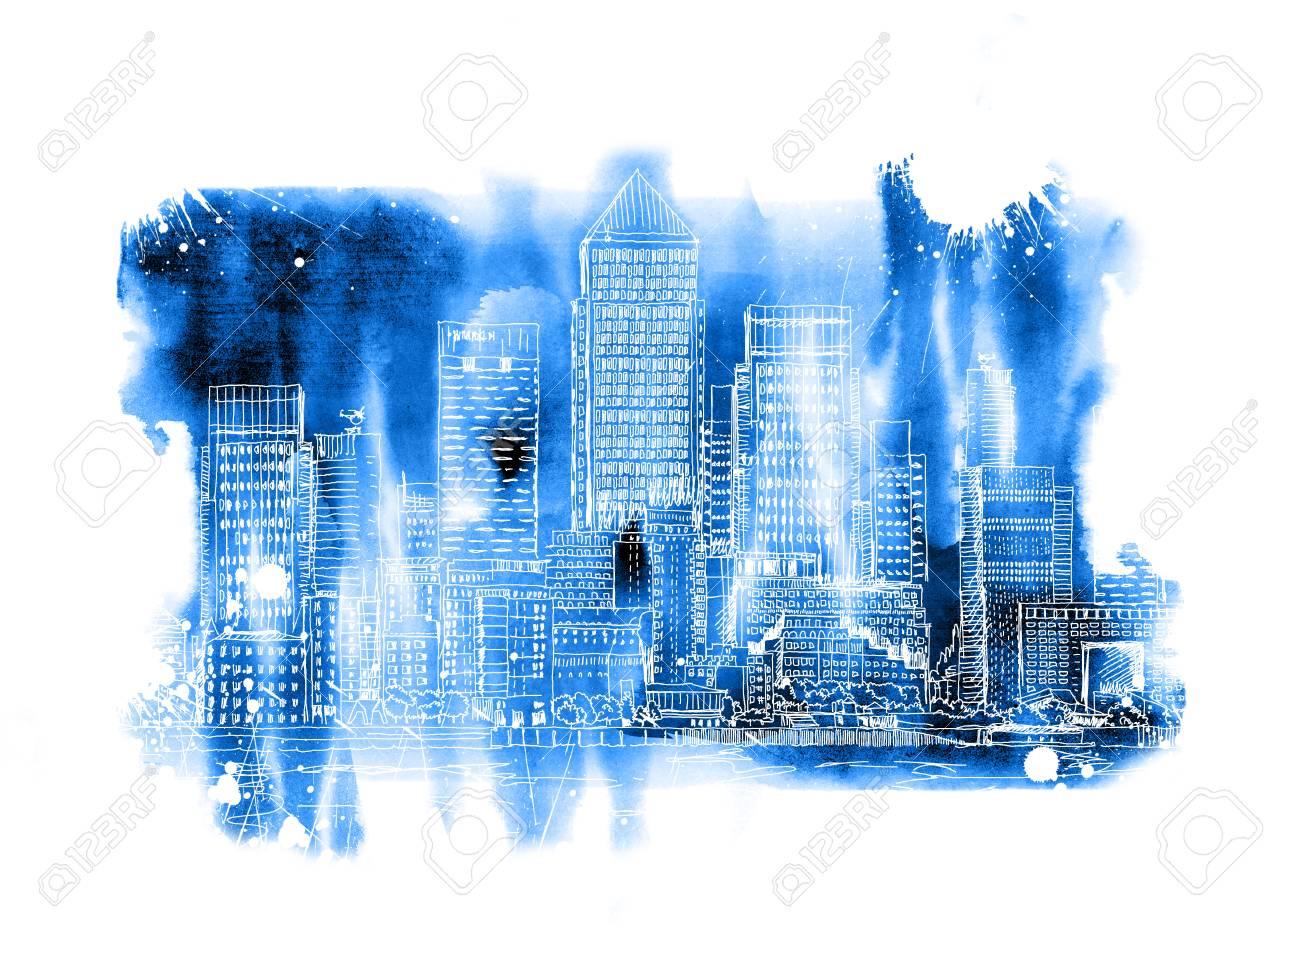 aria london bio